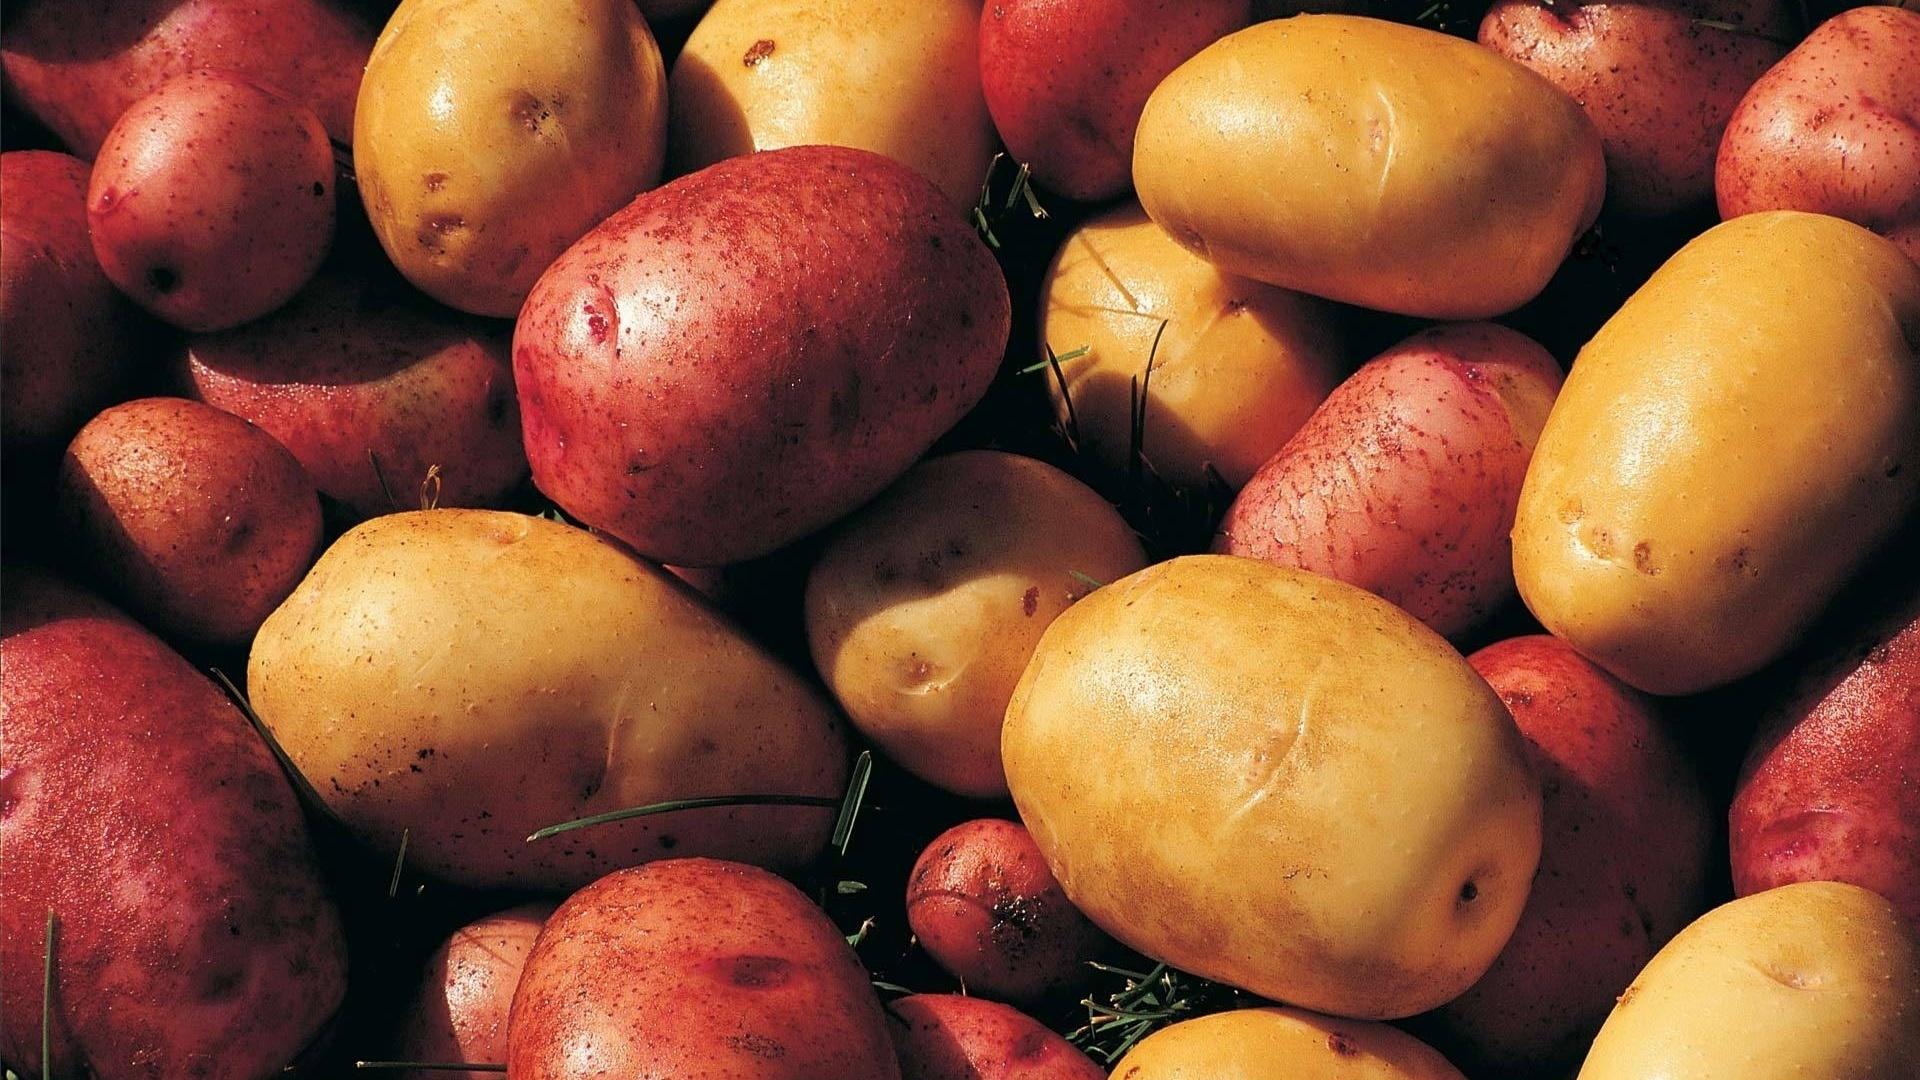 Potatoes Wallpaper Picture hd